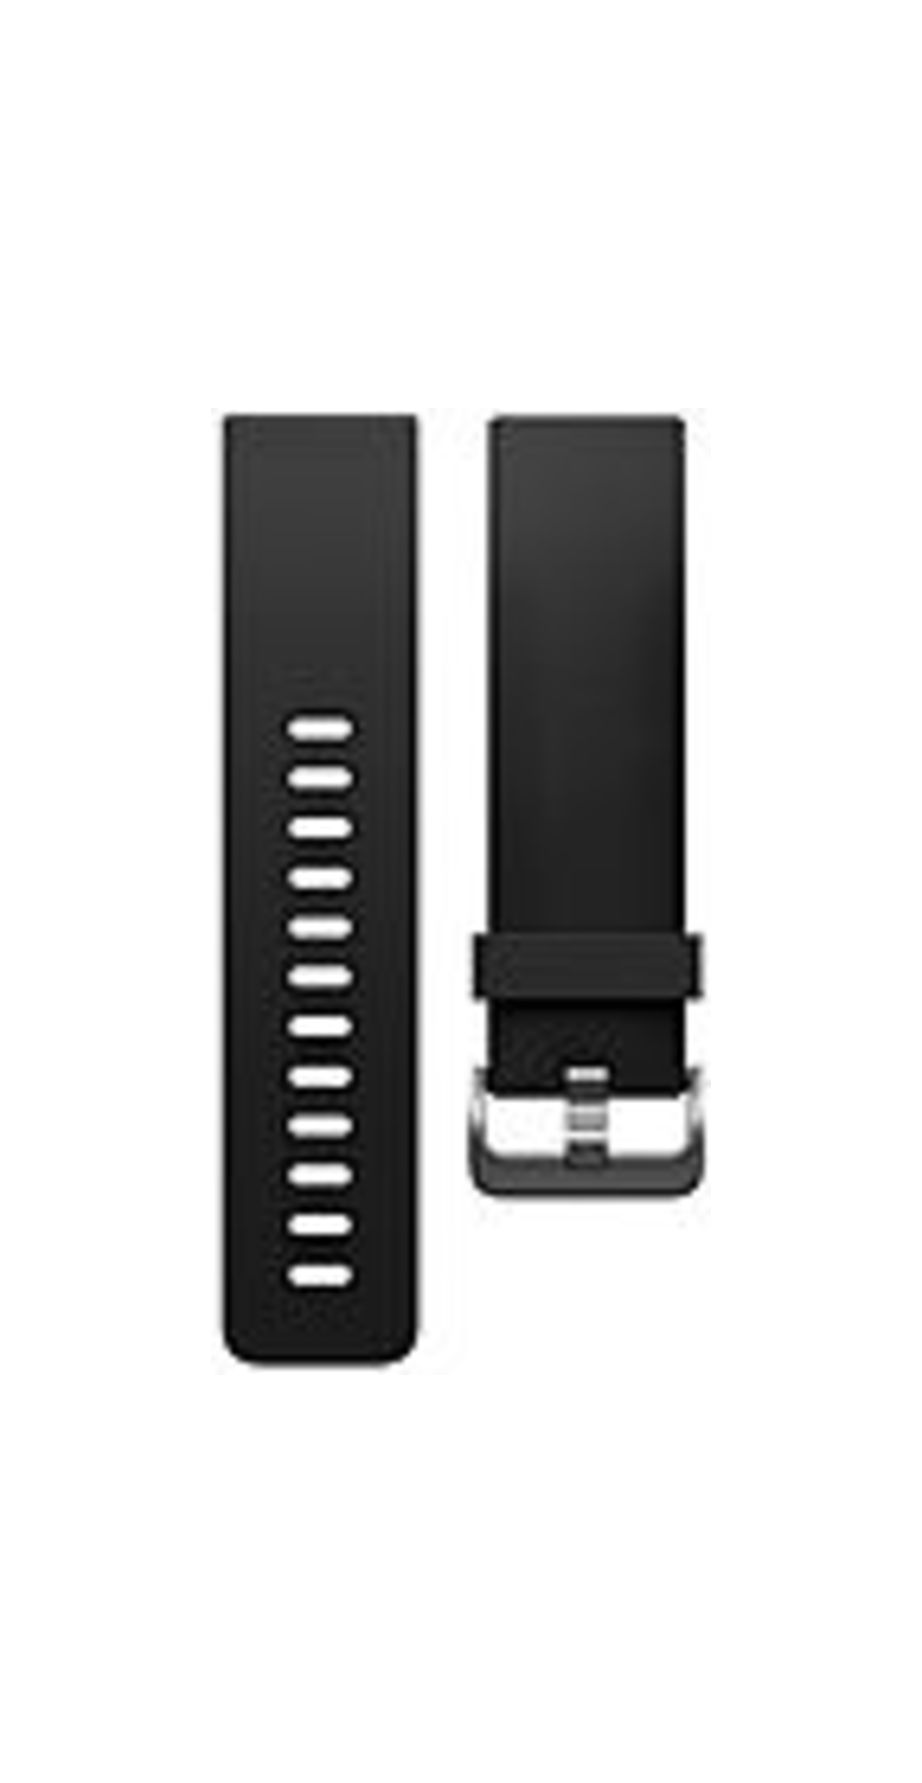 Fitbit Blaze Classic Band - Black - Elastomer, Stainless Steel